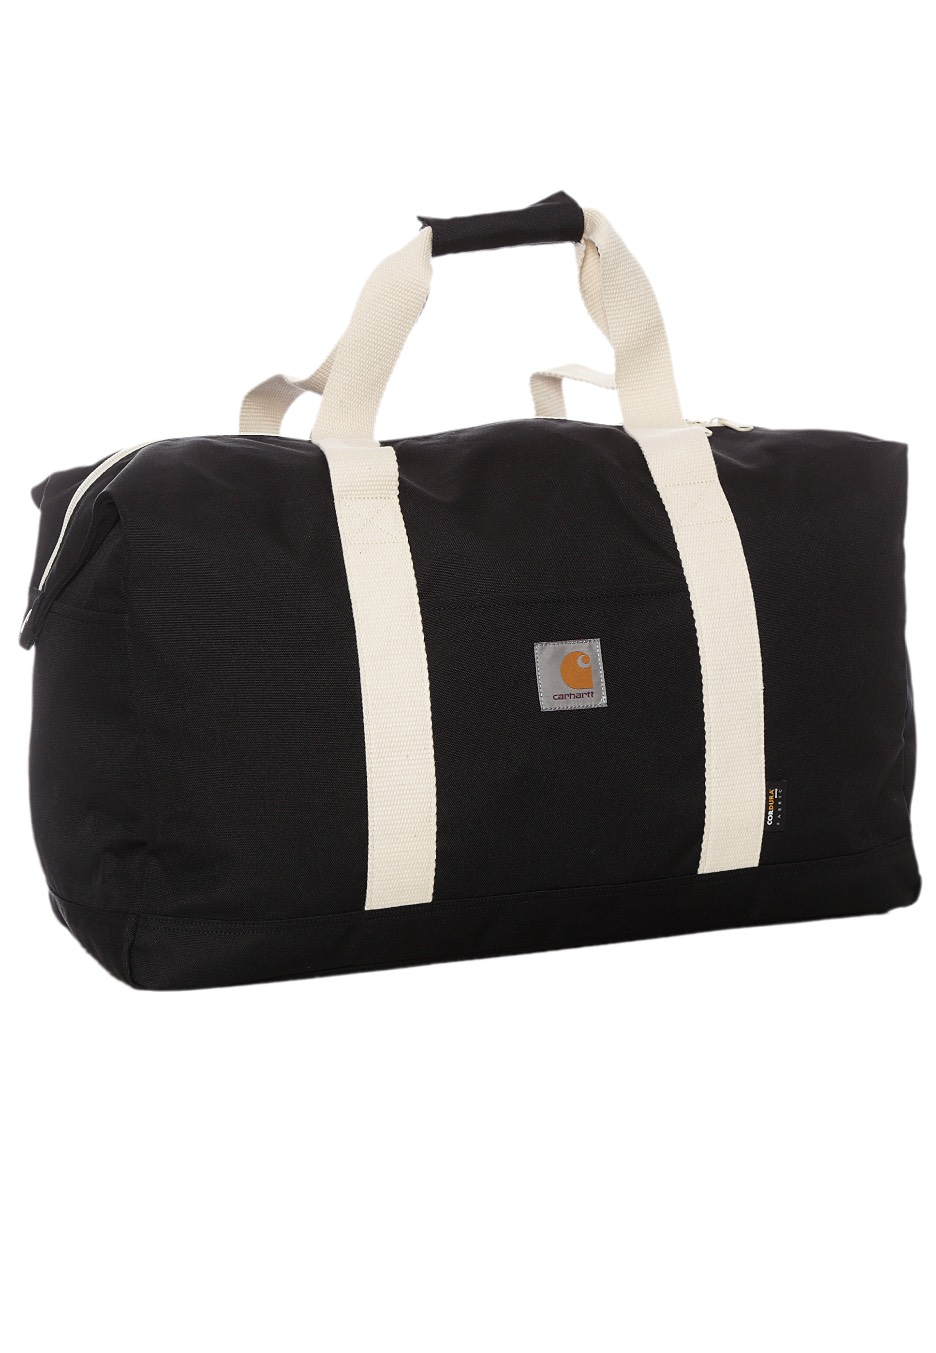 Carhartt WIP - Watch Sport - Bag - Streetwear Shop - Impericon.com ...